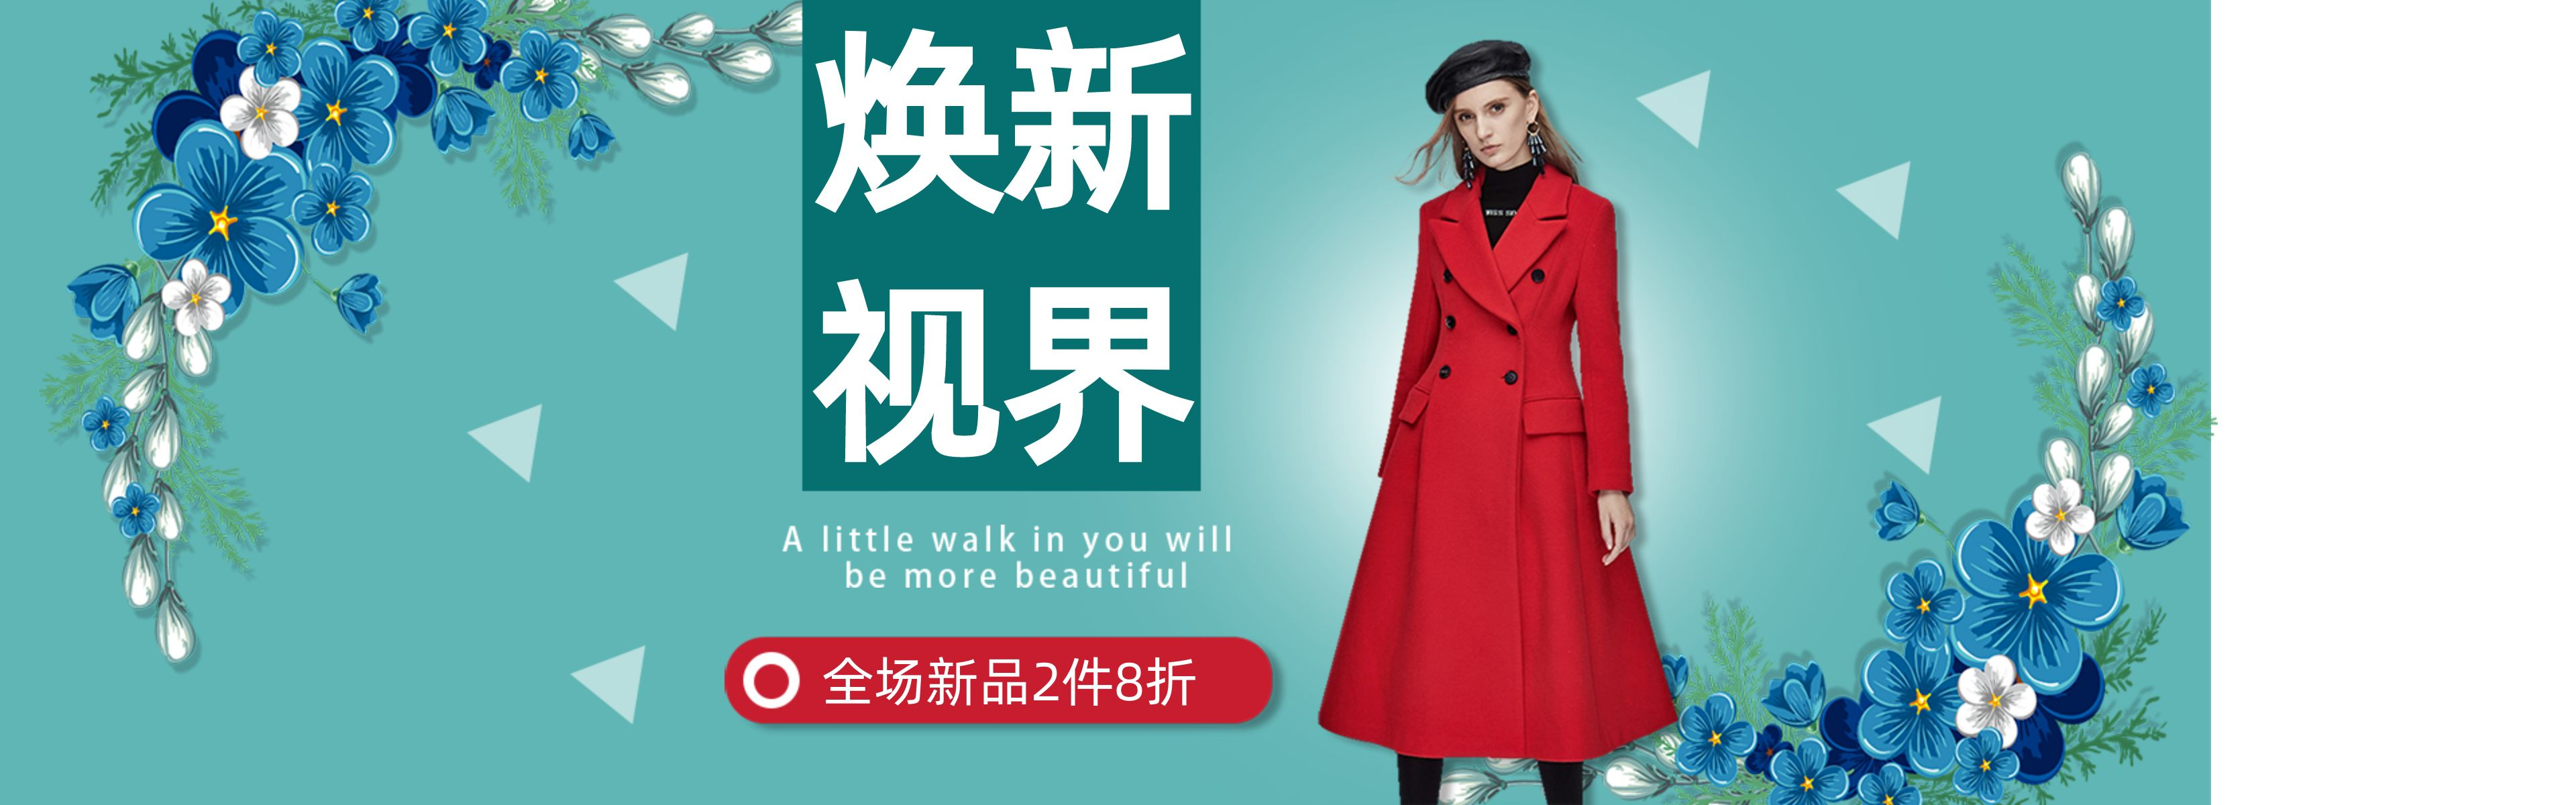 时尚清新电商banner海报